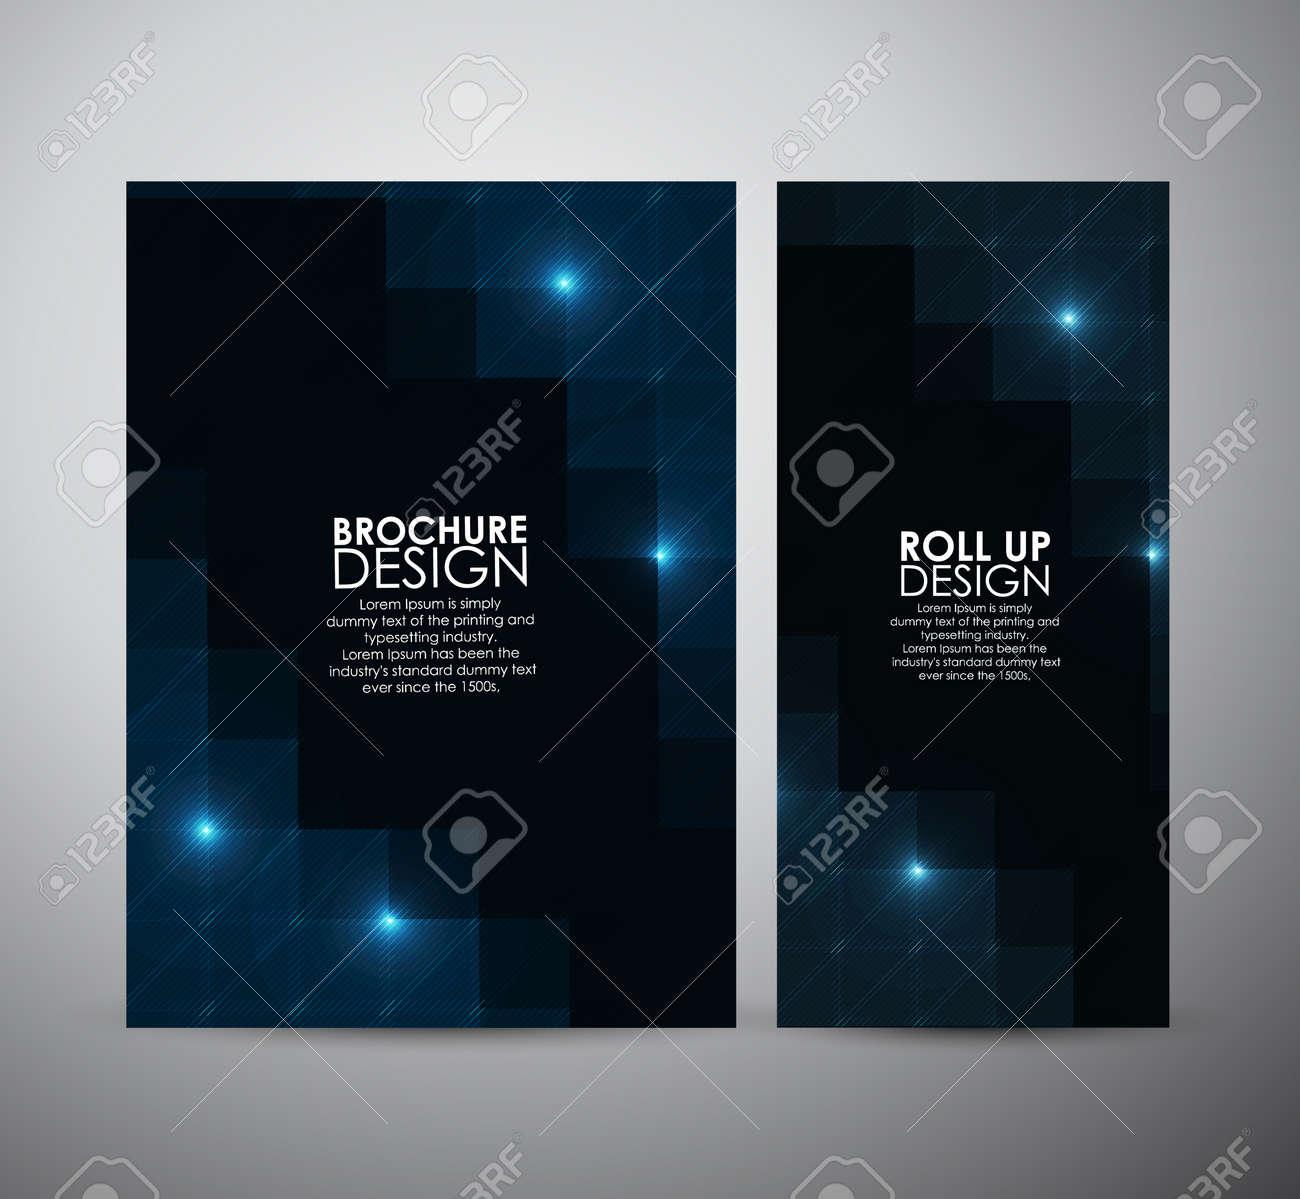 Broschüre Business-Design Abstrakte Moderne Muster Stilvolle Textur ...